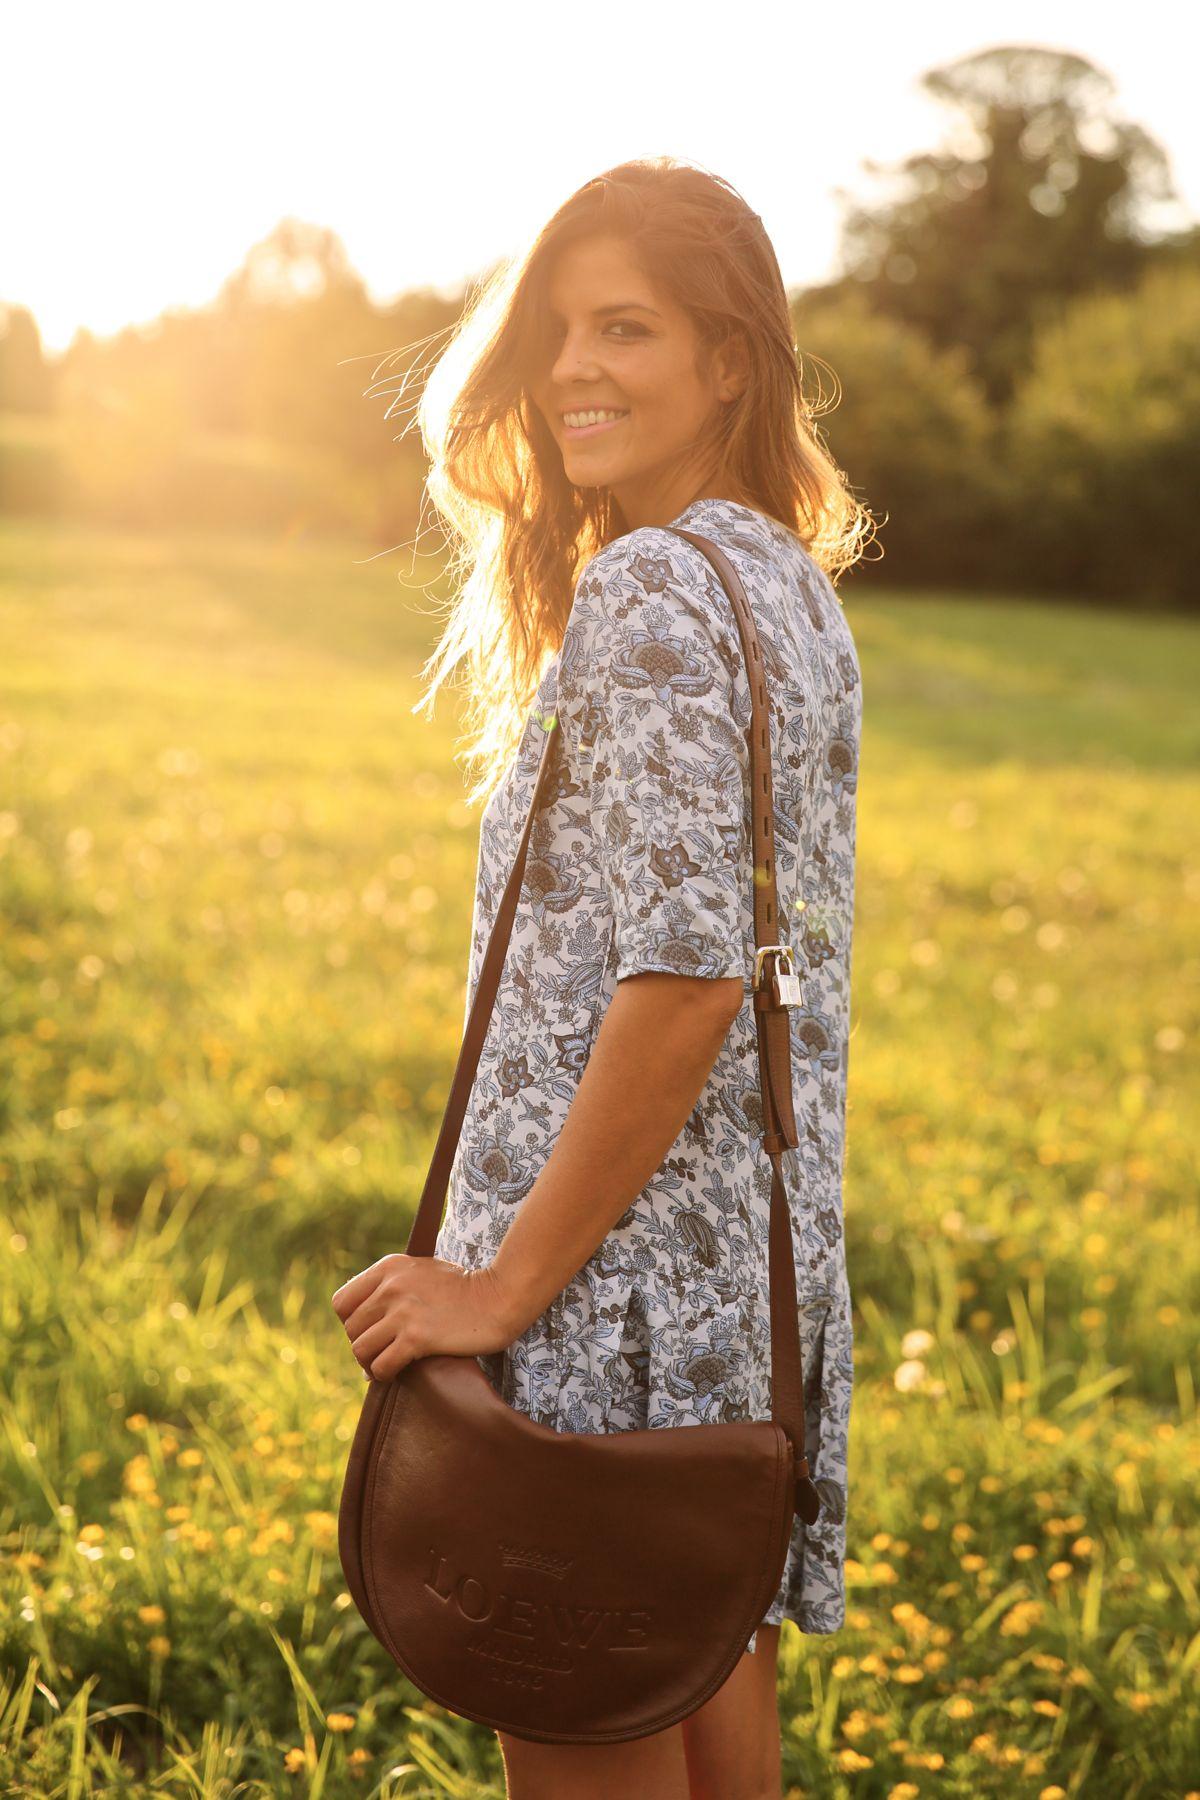 trendy_taste-look-outfit-street_style-ootd-blog-blogger-fashion_spain-moda_españa-cowboy-campero-sendra-cowboy_boots-botas_camperas-loewe-bag-bolso-vestido_flores-flower_print-dress-4